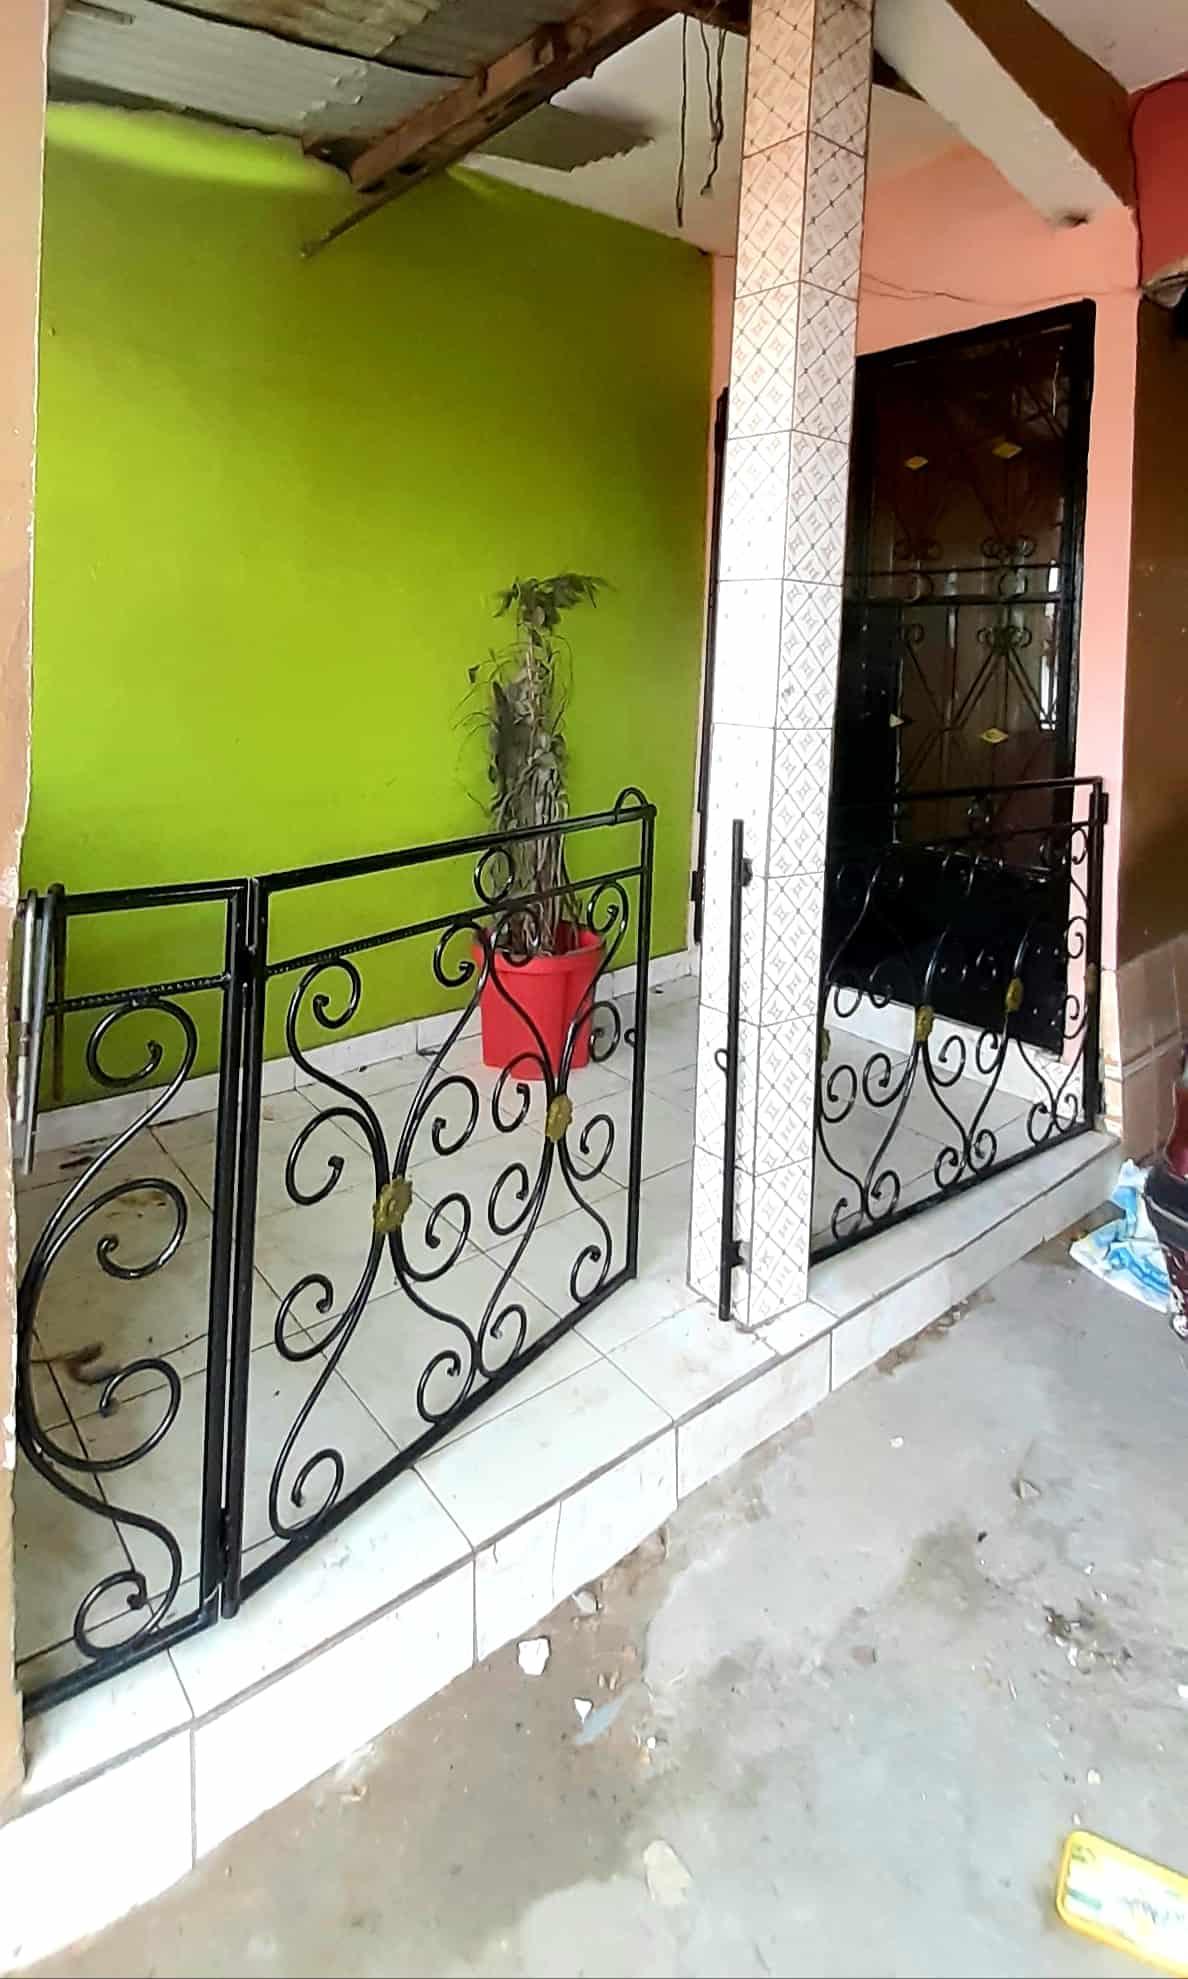 Apartment to rent - Douala, Bepanda, Bepanda petit Marché - 1 living room(s), 3 bedroom(s), 2 bathroom(s) - 100 000 FCFA / month